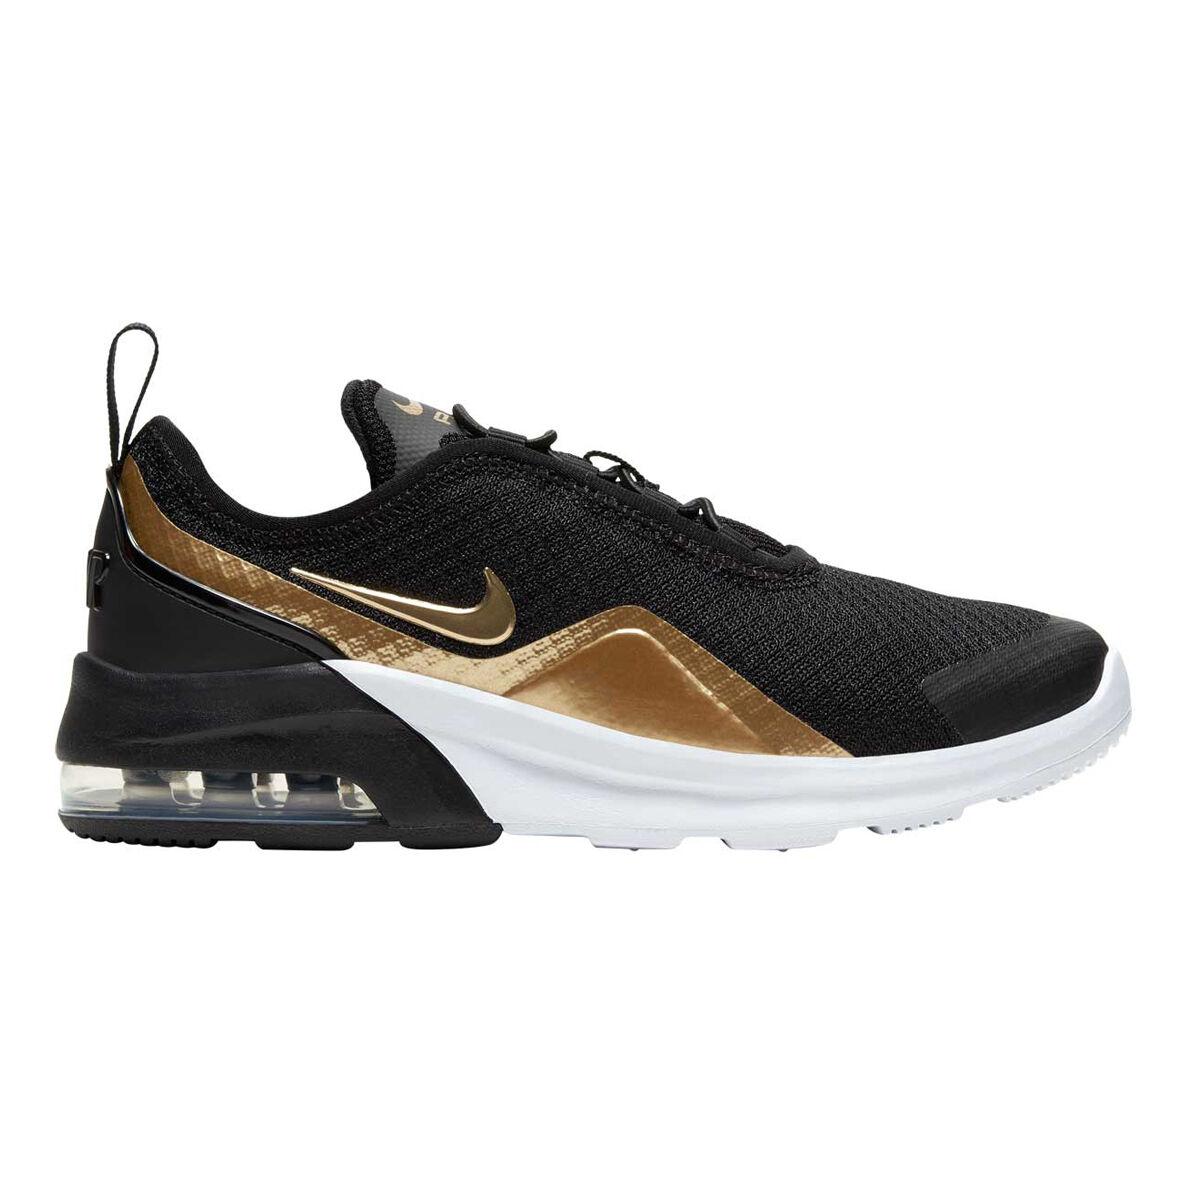 Nike WMNS Air Max 901 Trainers AQ1273